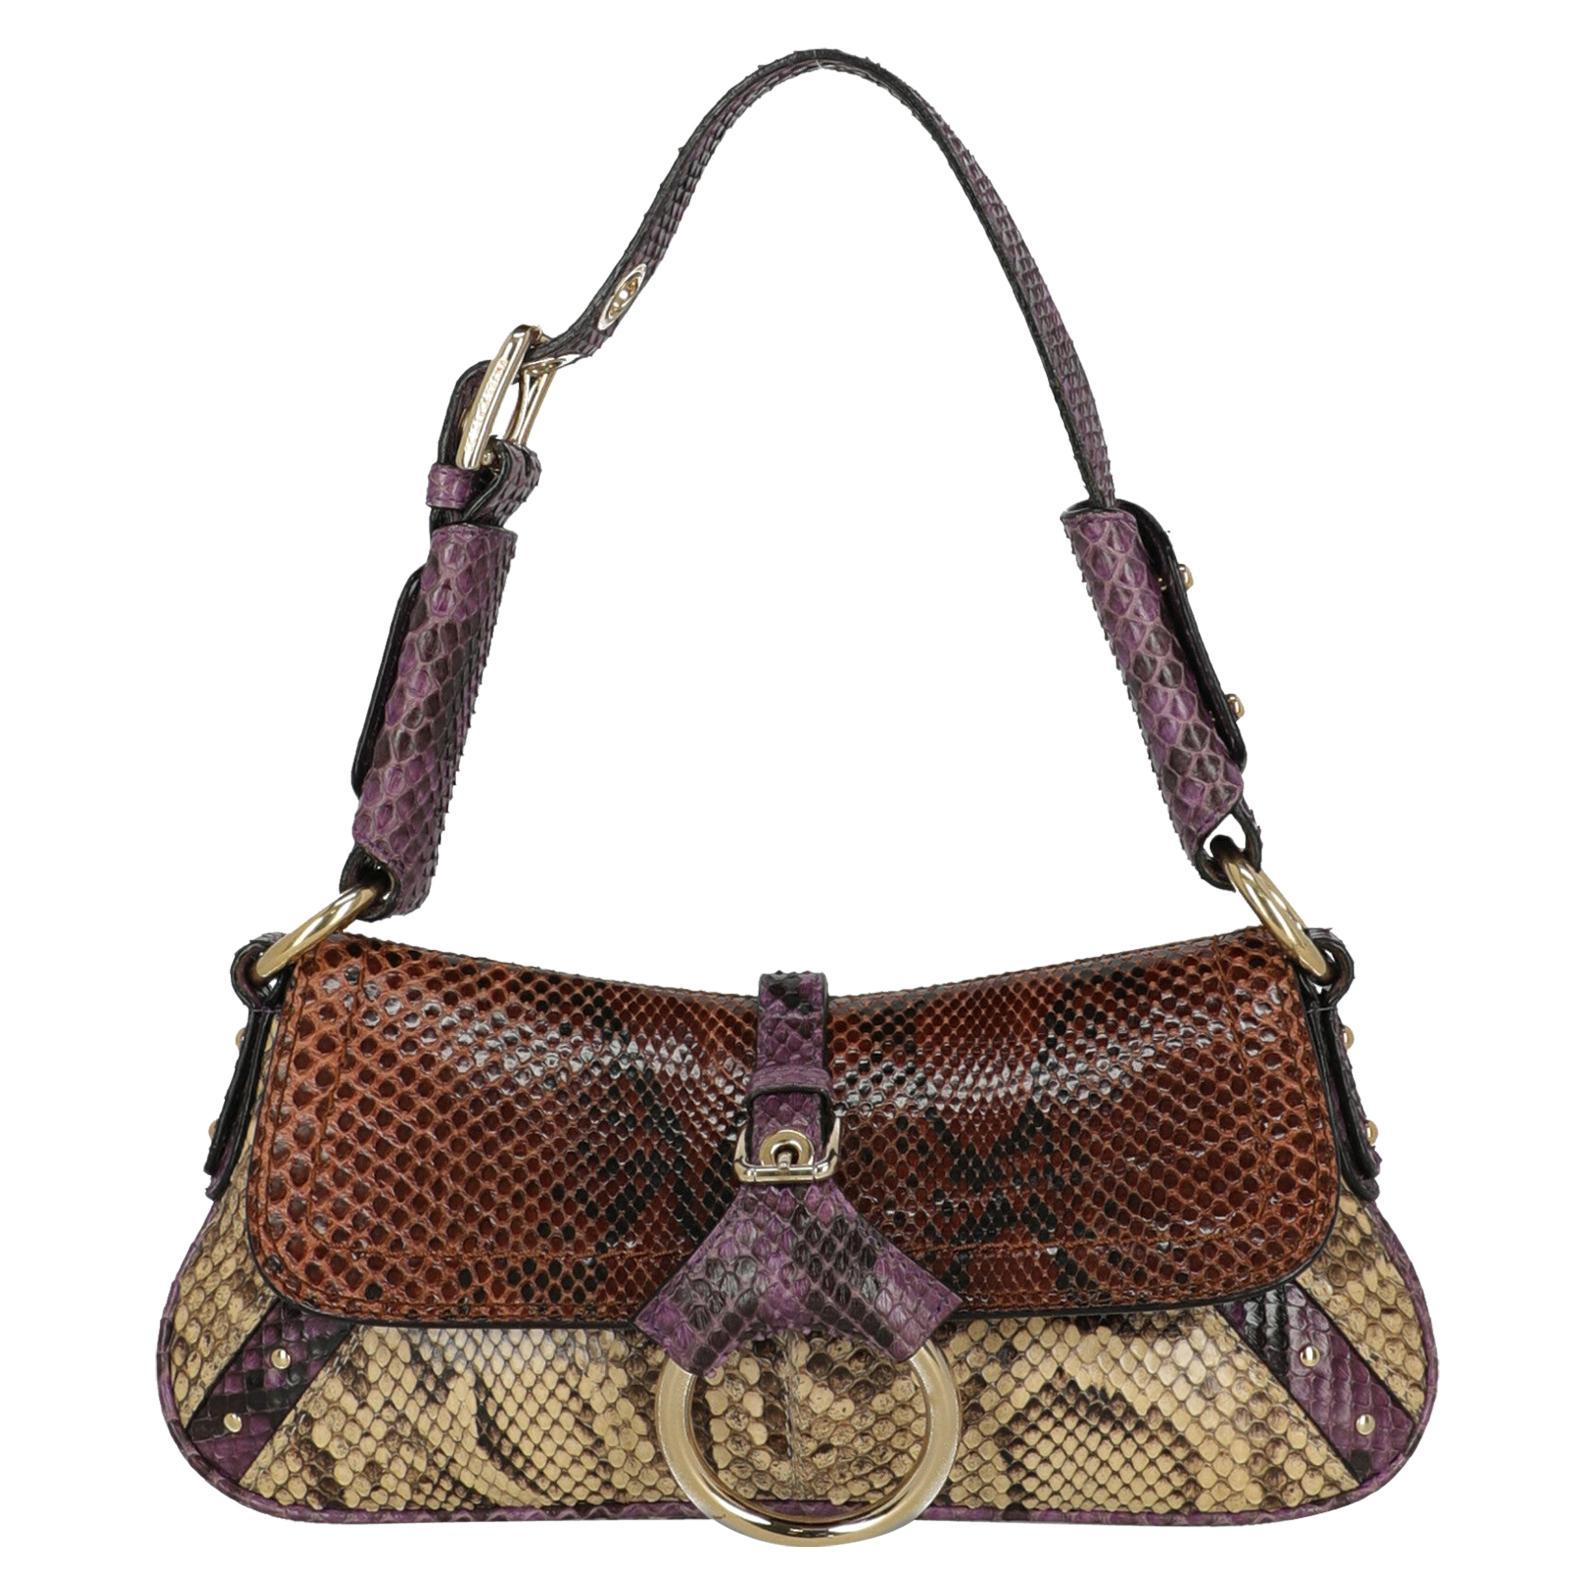 Dolce & Gabbana  Women   Shoulder bags  Beige, Brown, Purple Leather